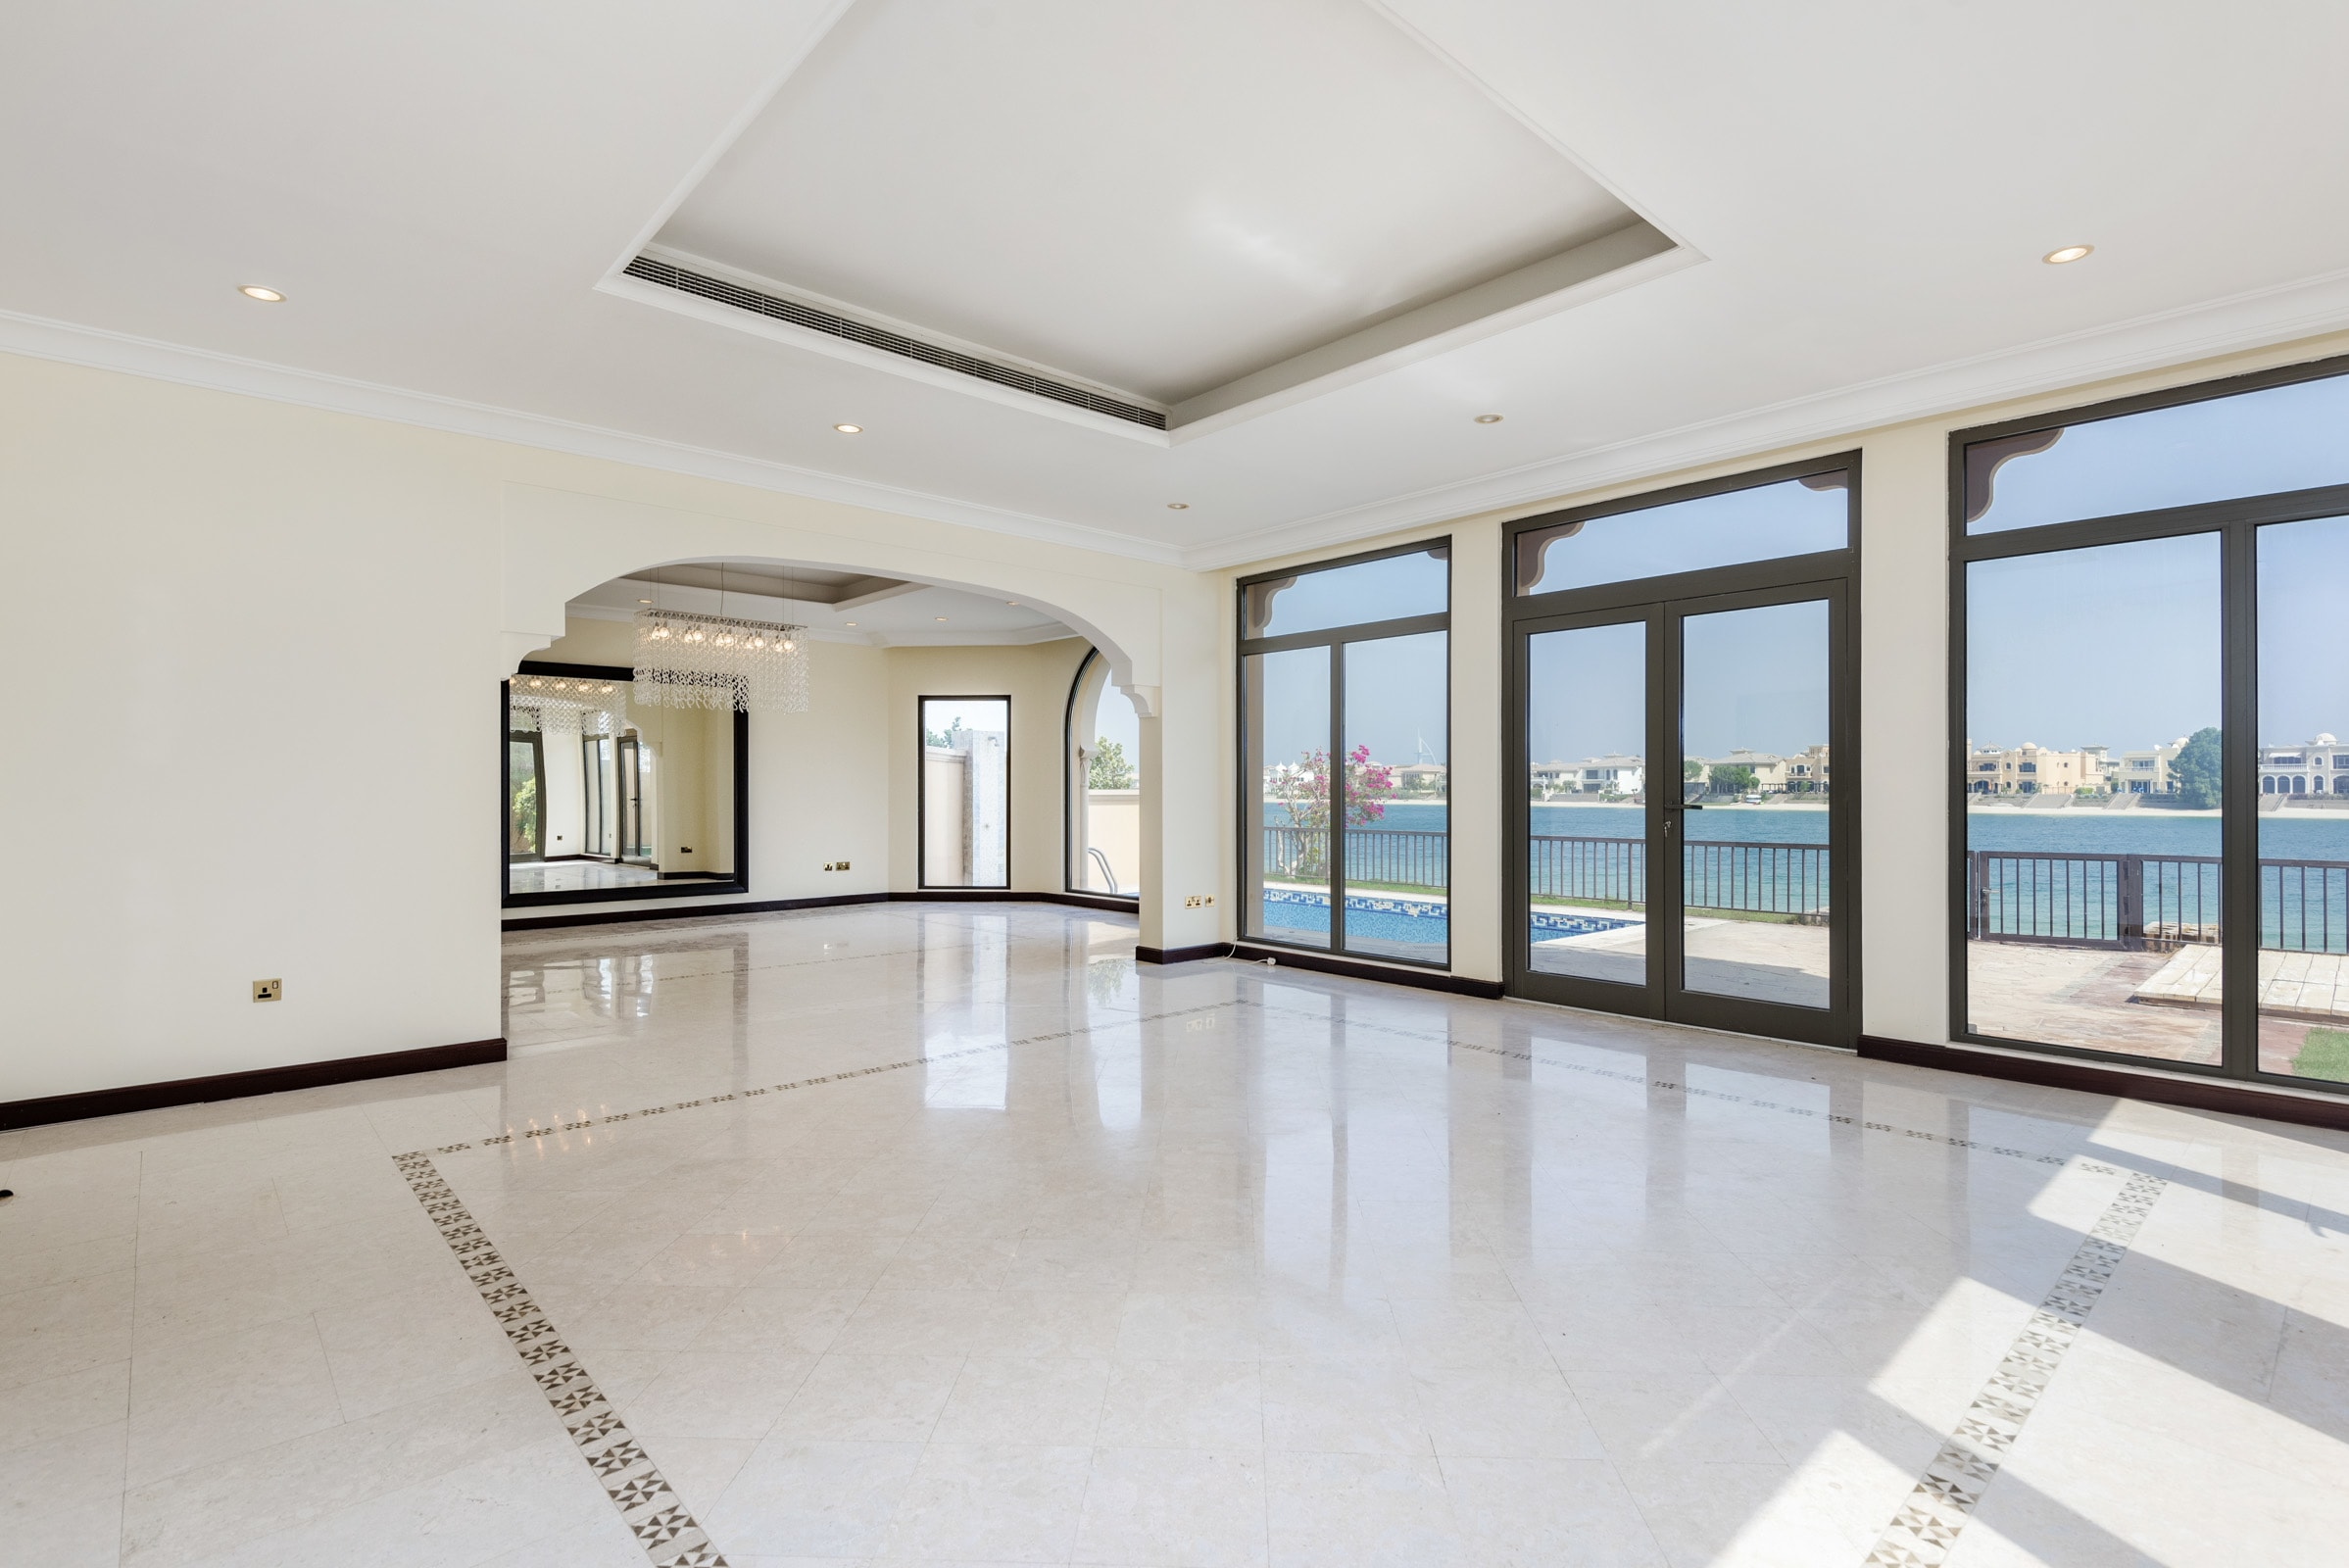 Atrium Entry 5BR Villa Burj Al Arab View